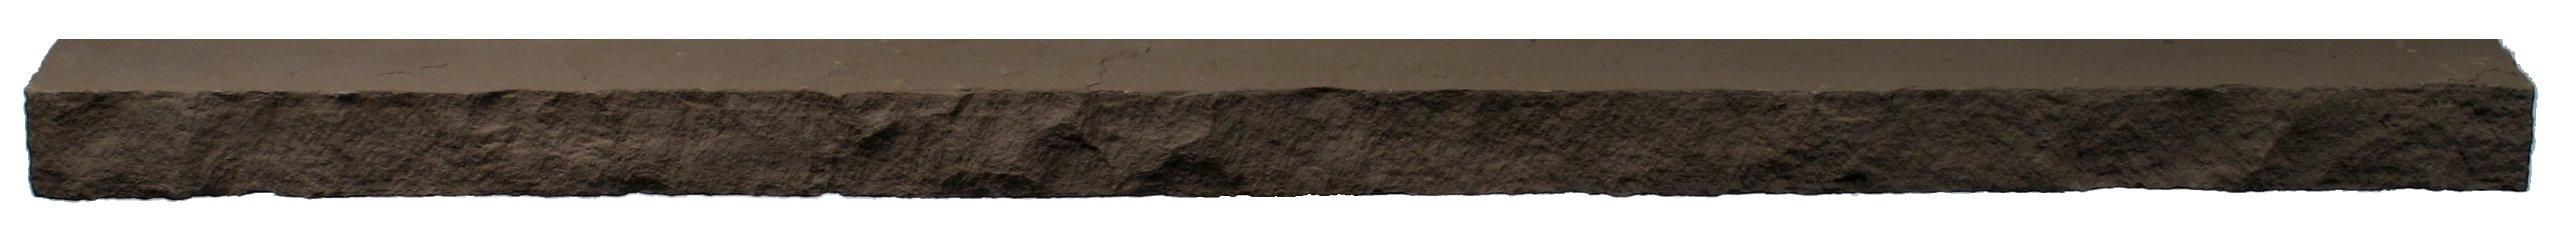 NextStone Sandstone 4 Foot Ledger Brown 4 Pack